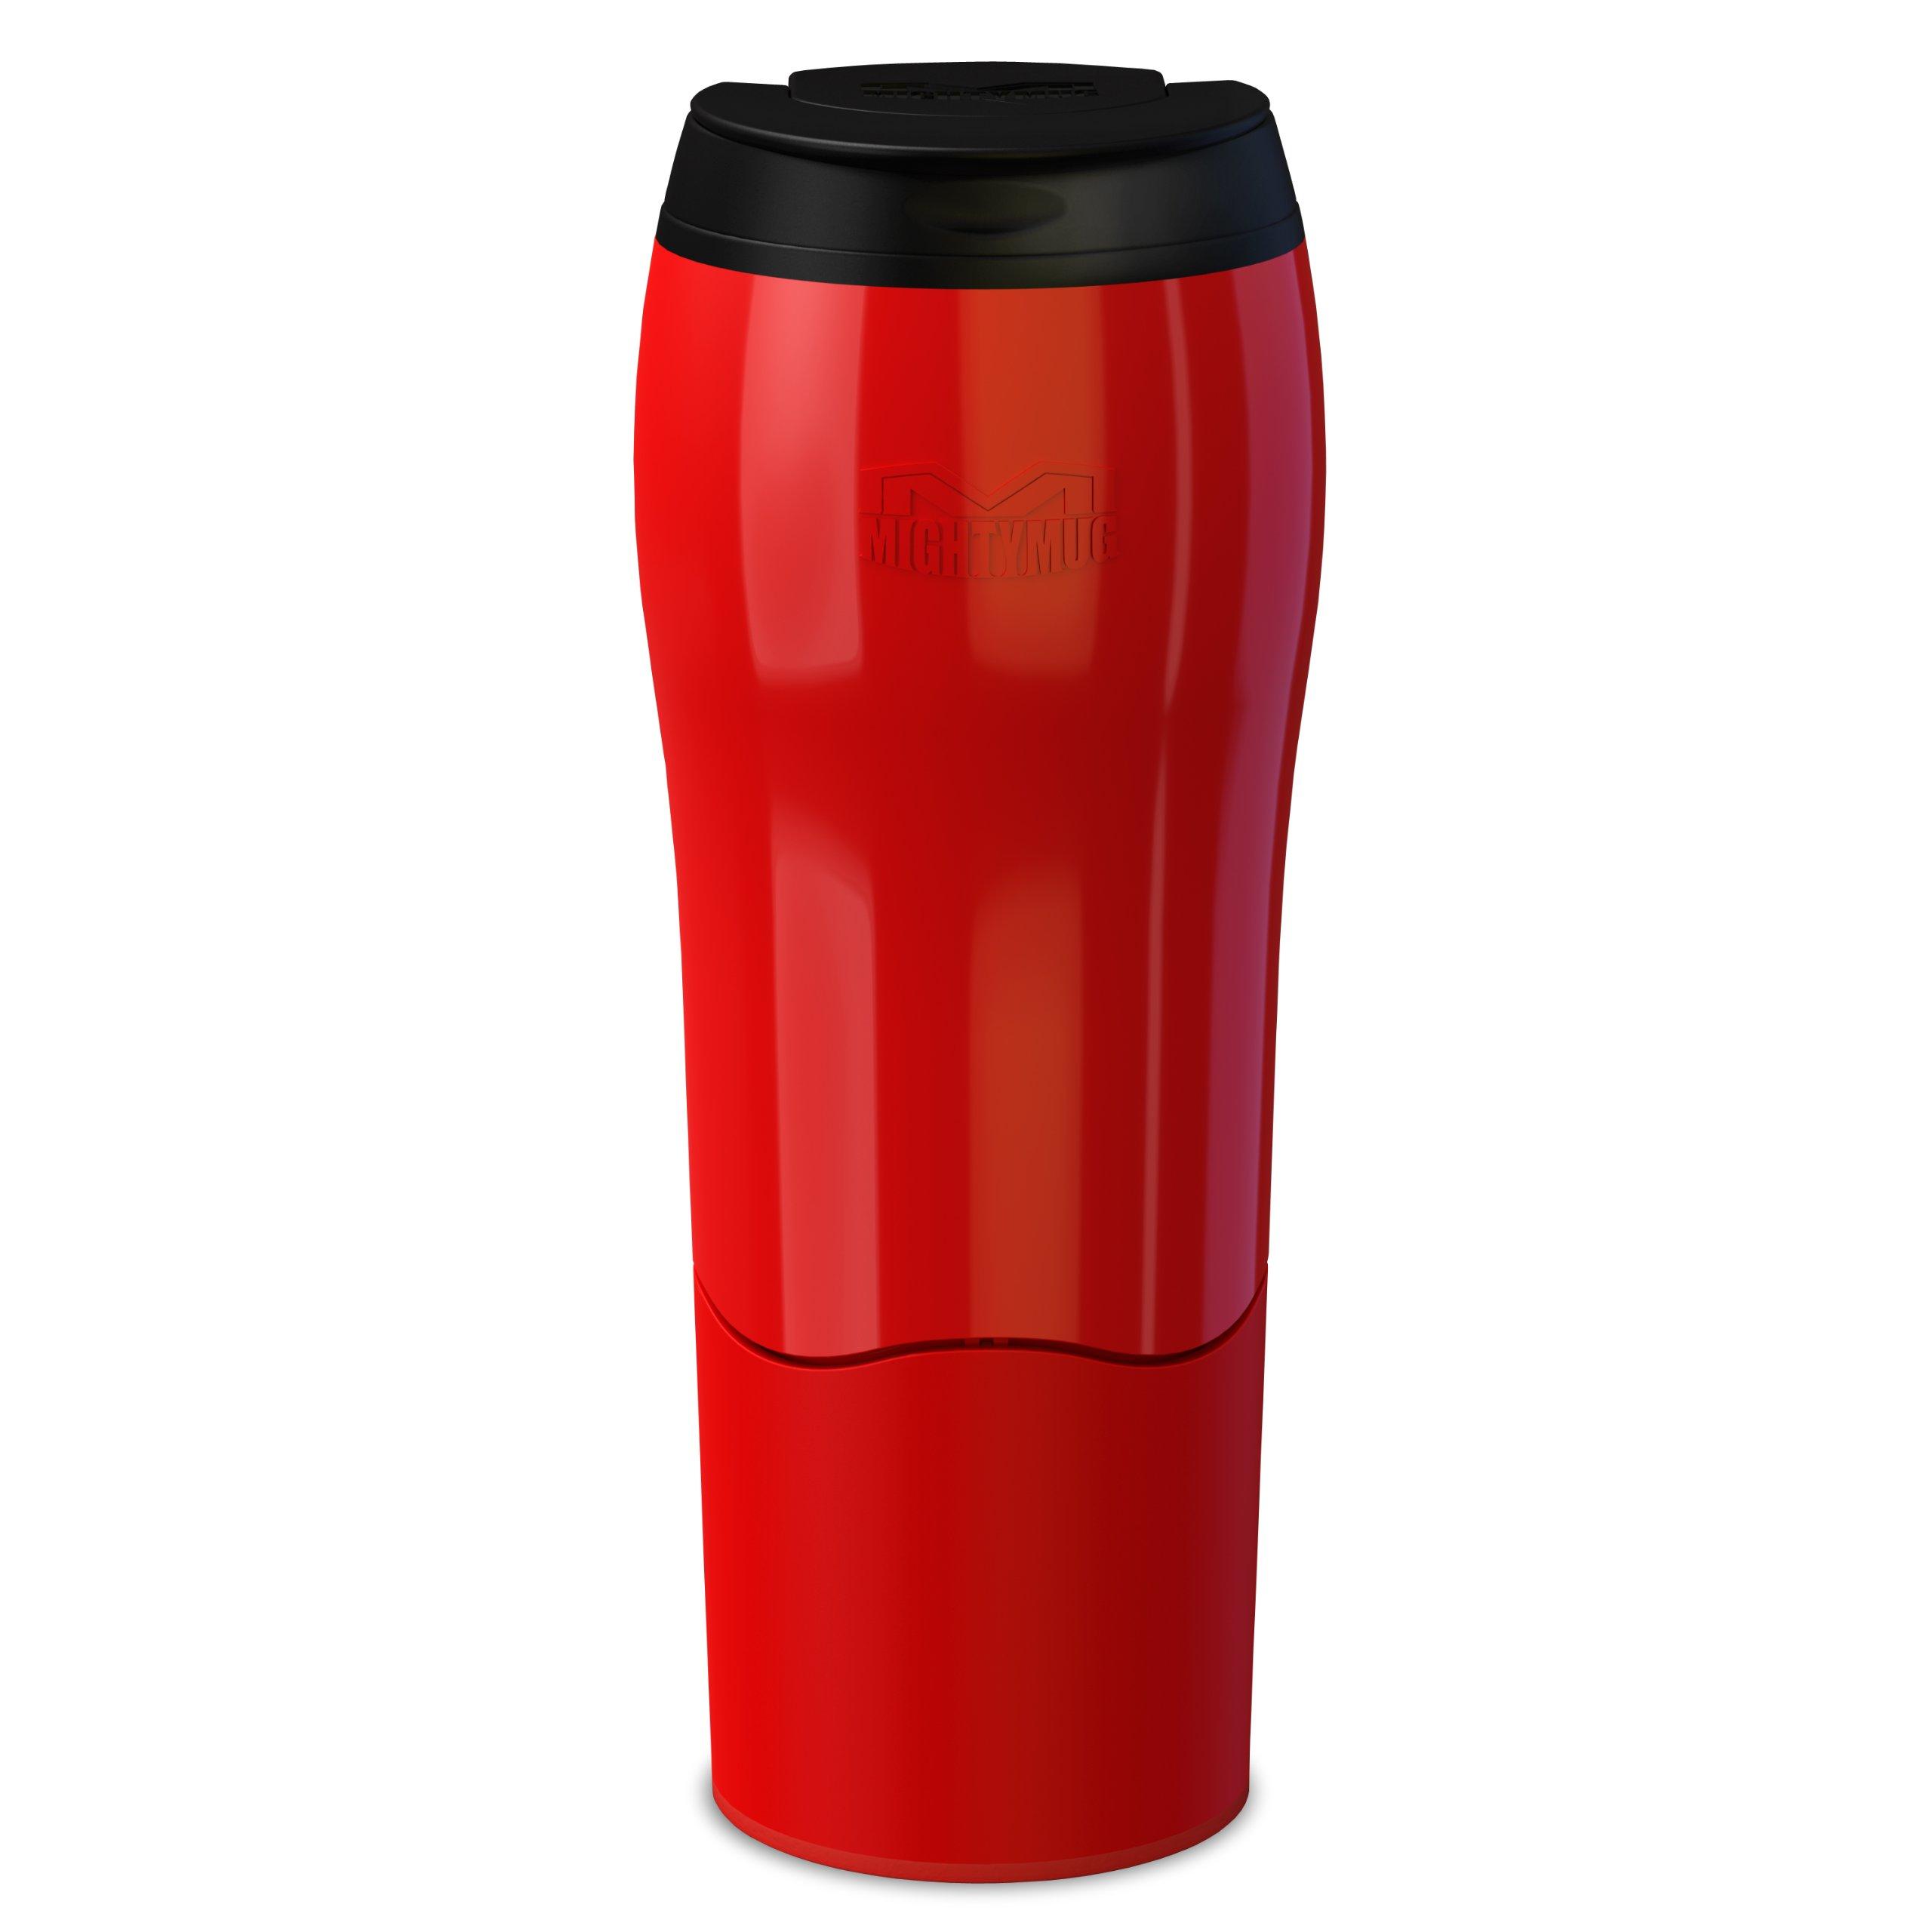 Dexam Mighty Mug Travel Mug 'the mug that won't fall over' Thermos in Red 17920225 by Dexam (Image #1)